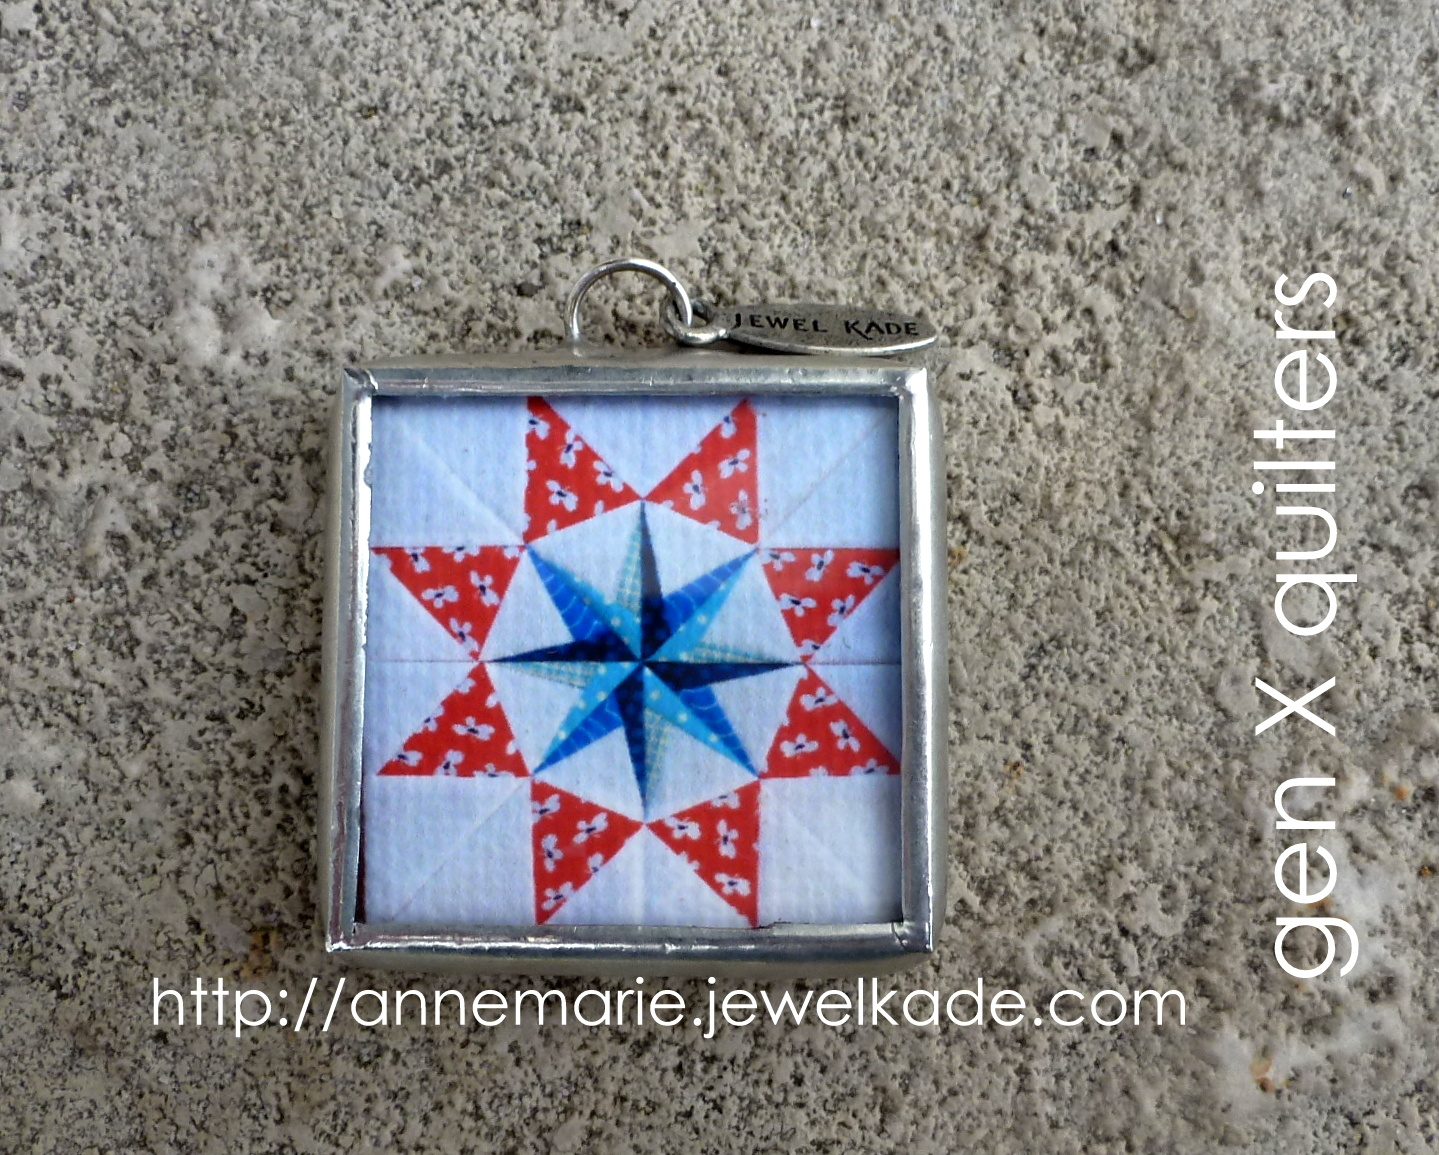 quilt block jewel kade charm front